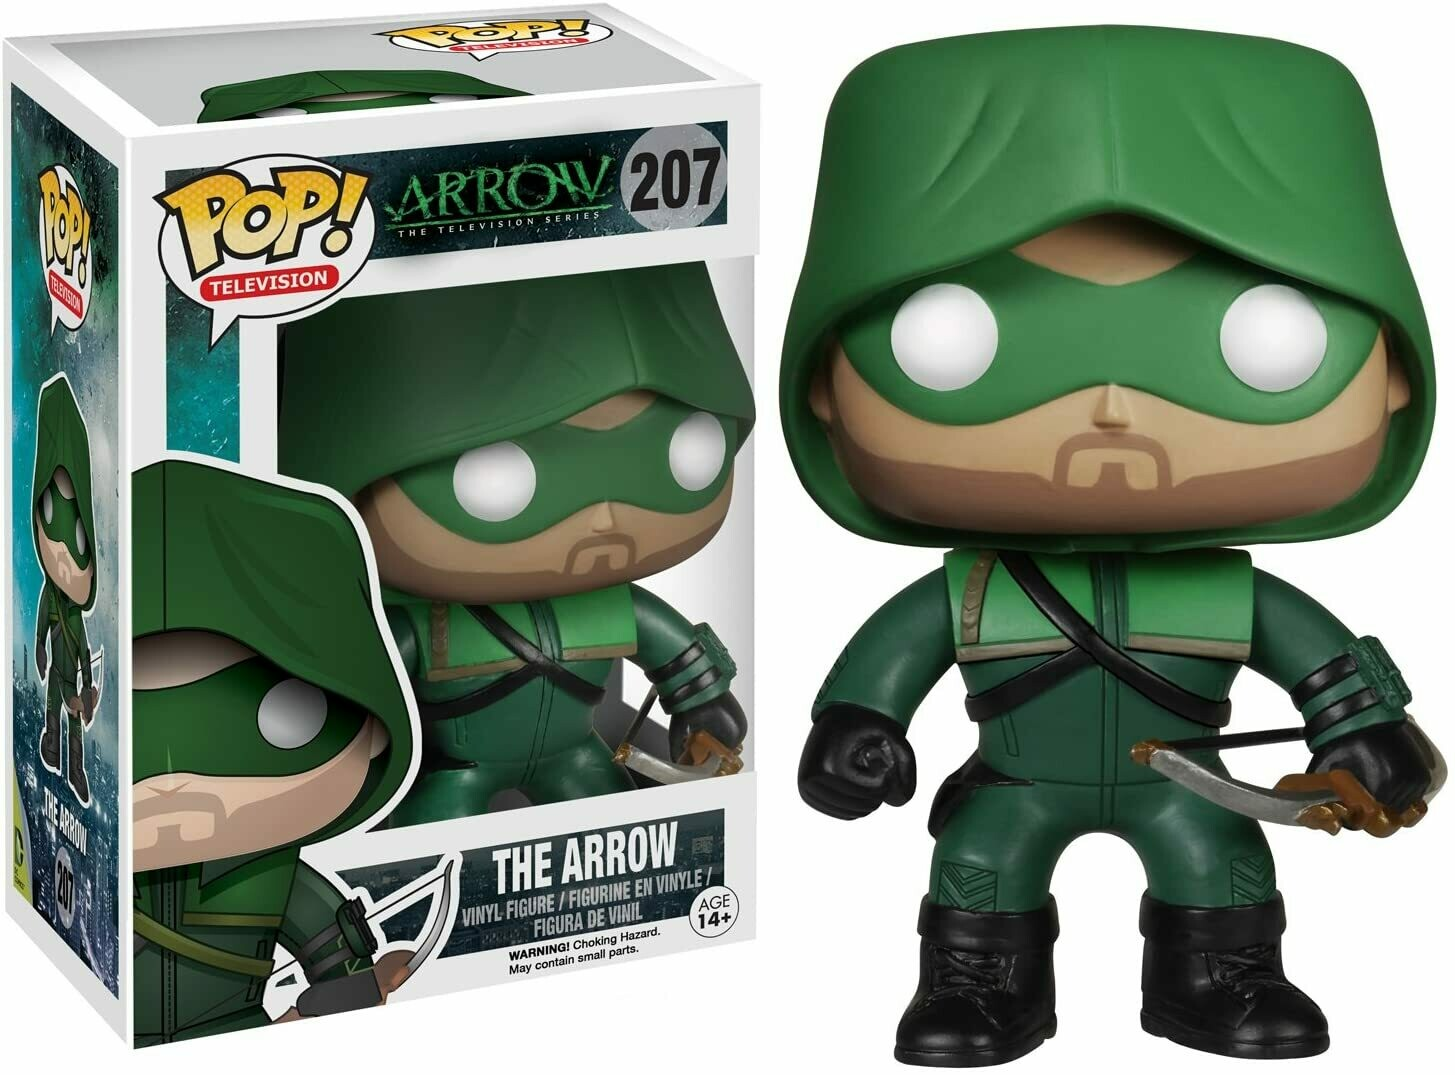 Funko Pop! The Arrow